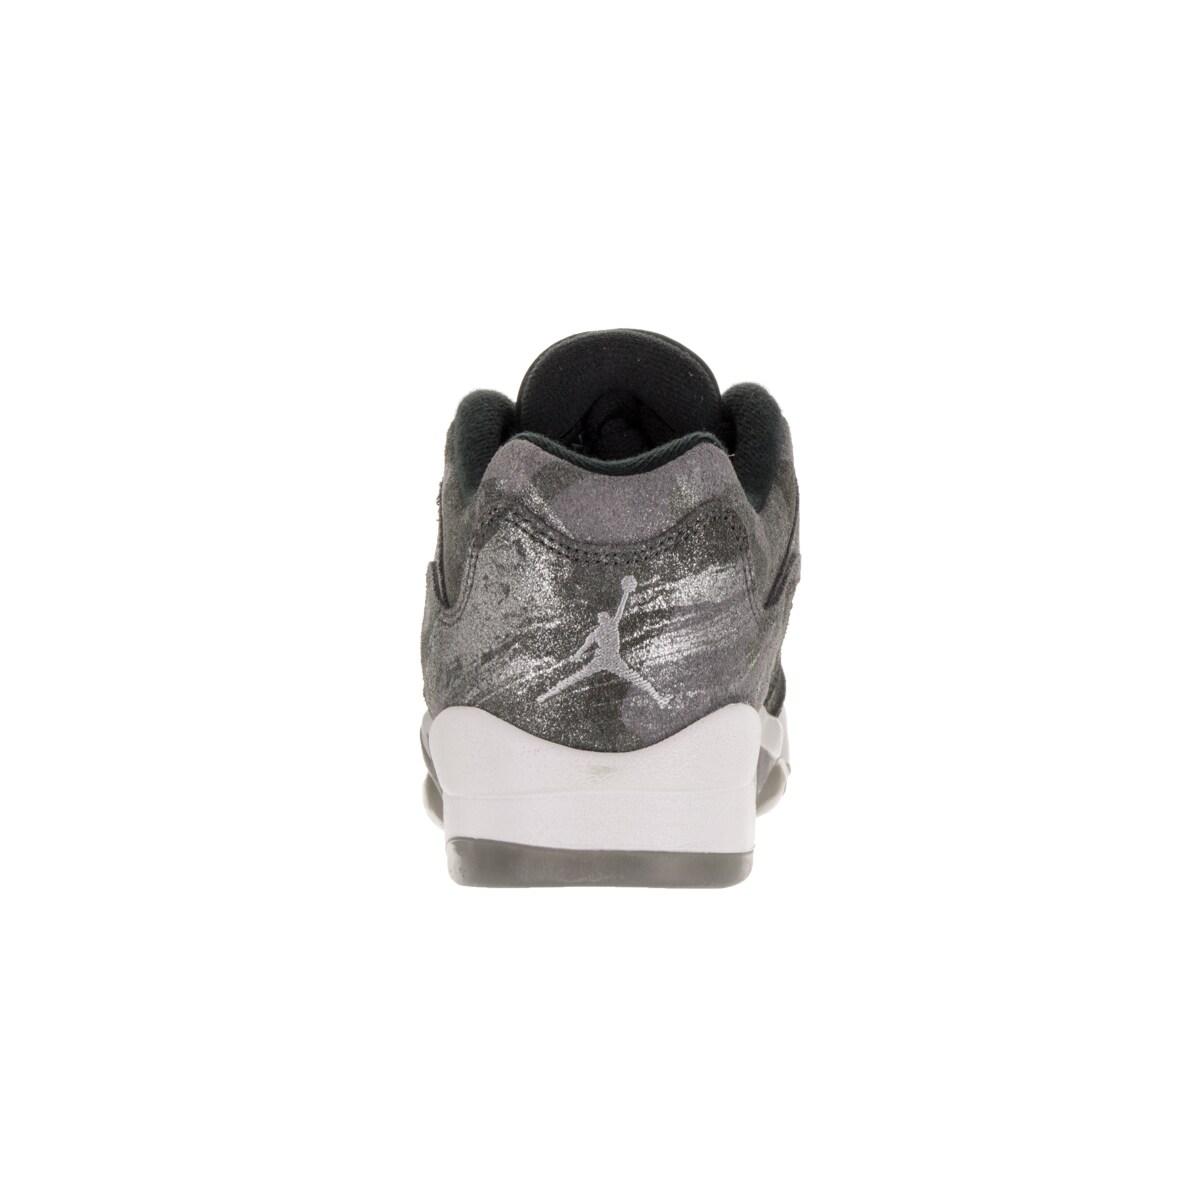 new style 70599 d969b Shop Nike Jordan Kid s Air Jordan 5 Retro Prem Low Gg Cool Grey Wolf Grey White Black  Basketball Shoe - Free Shipping Today - - 12322358